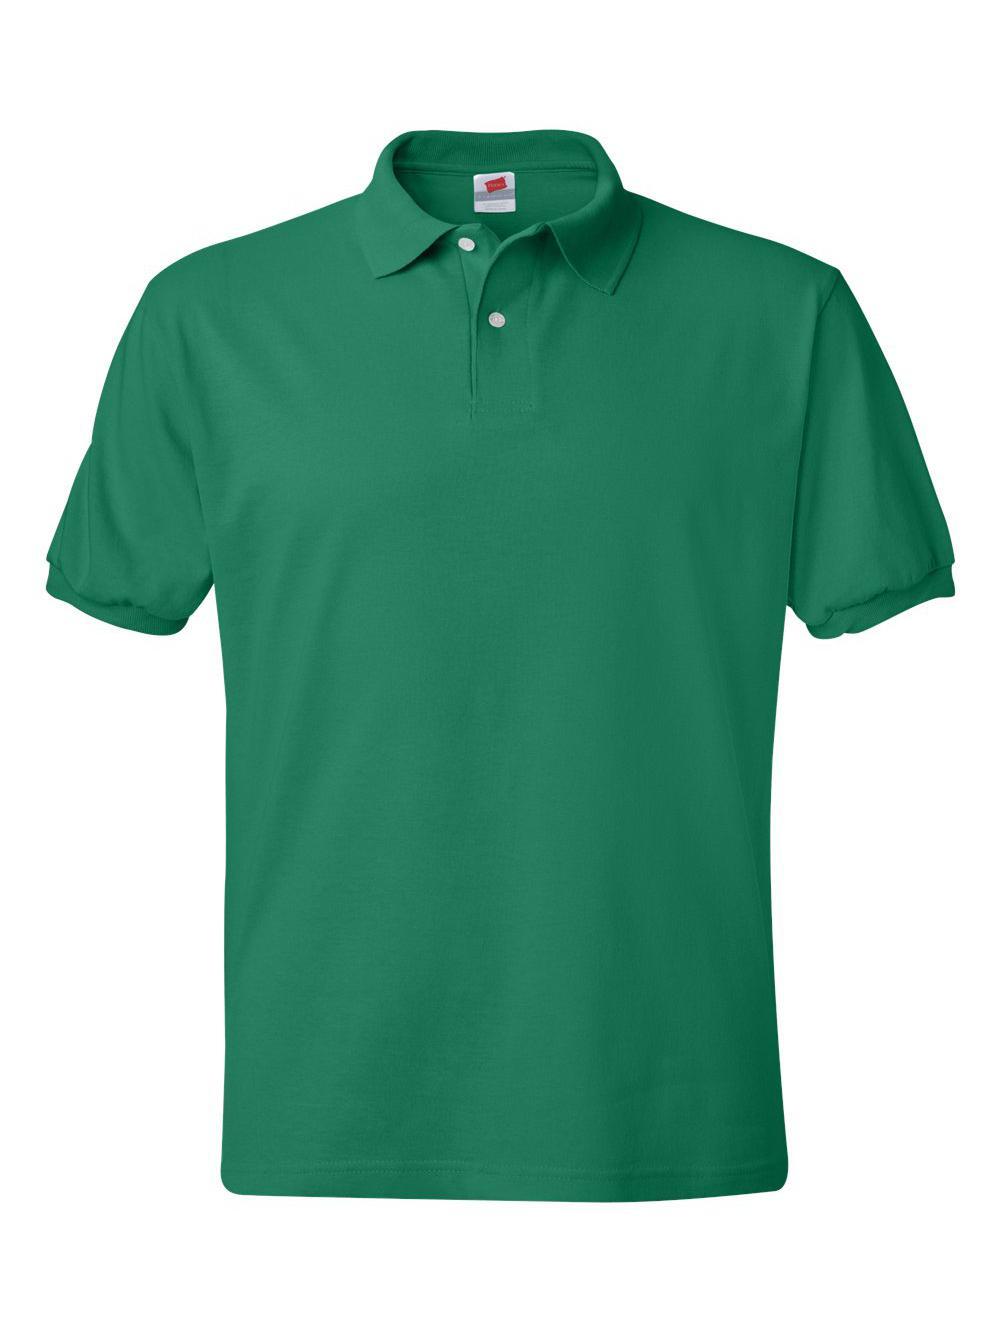 Hanes-Ecosmart-Jersey-Sport-Shirt-054X thumbnail 21